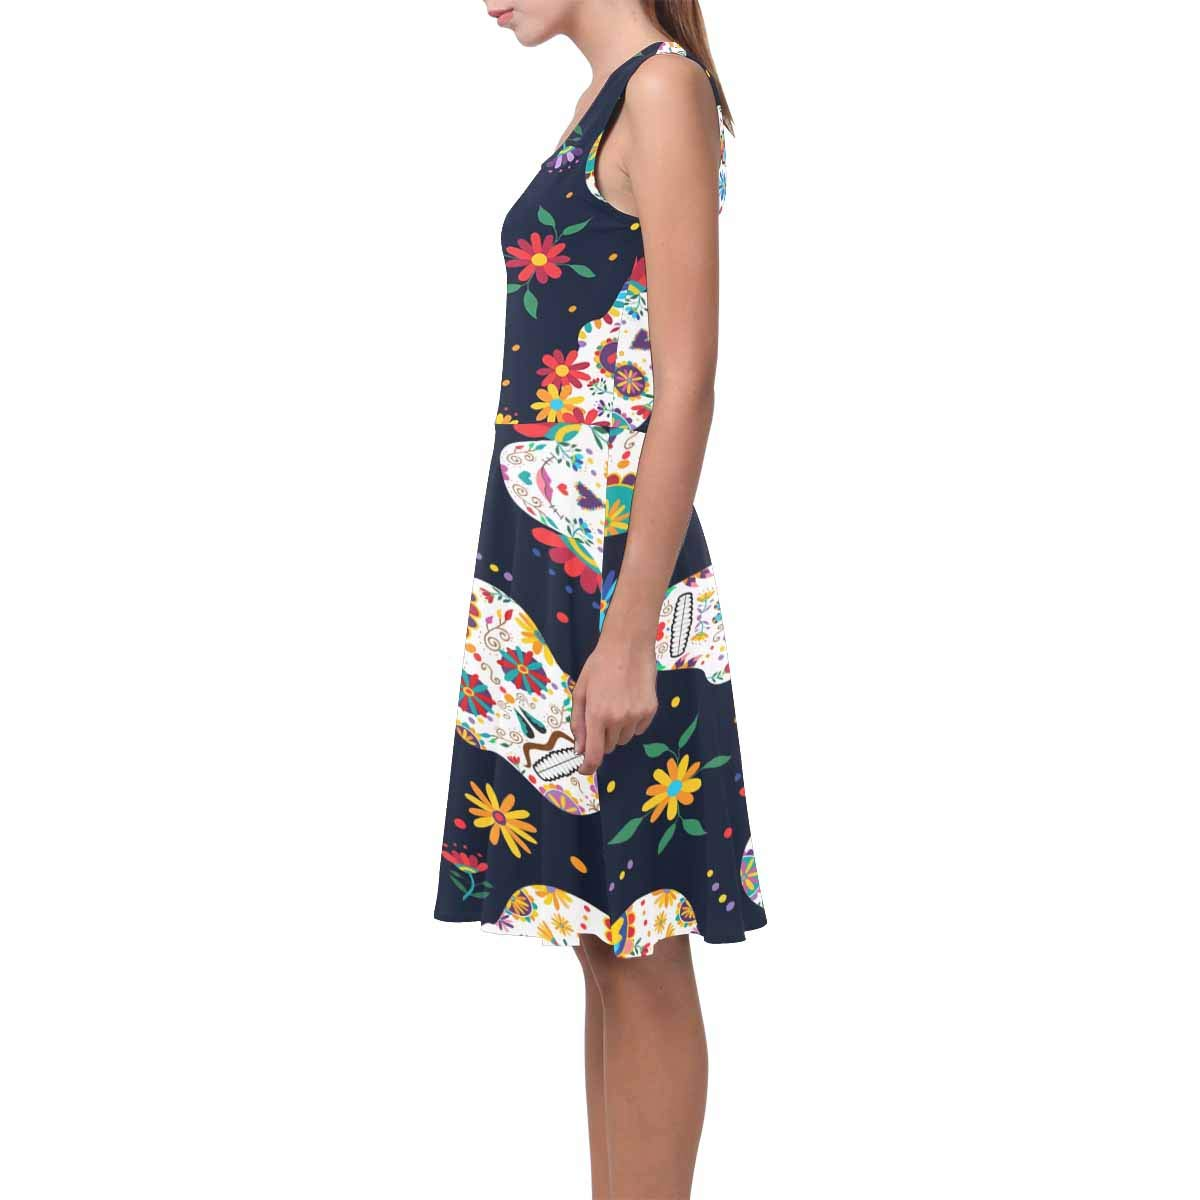 XS-3XL InterestPrint Womens Sleeveless Tank Dresses Sugar Skull Flowers Casual Flared Sundresses